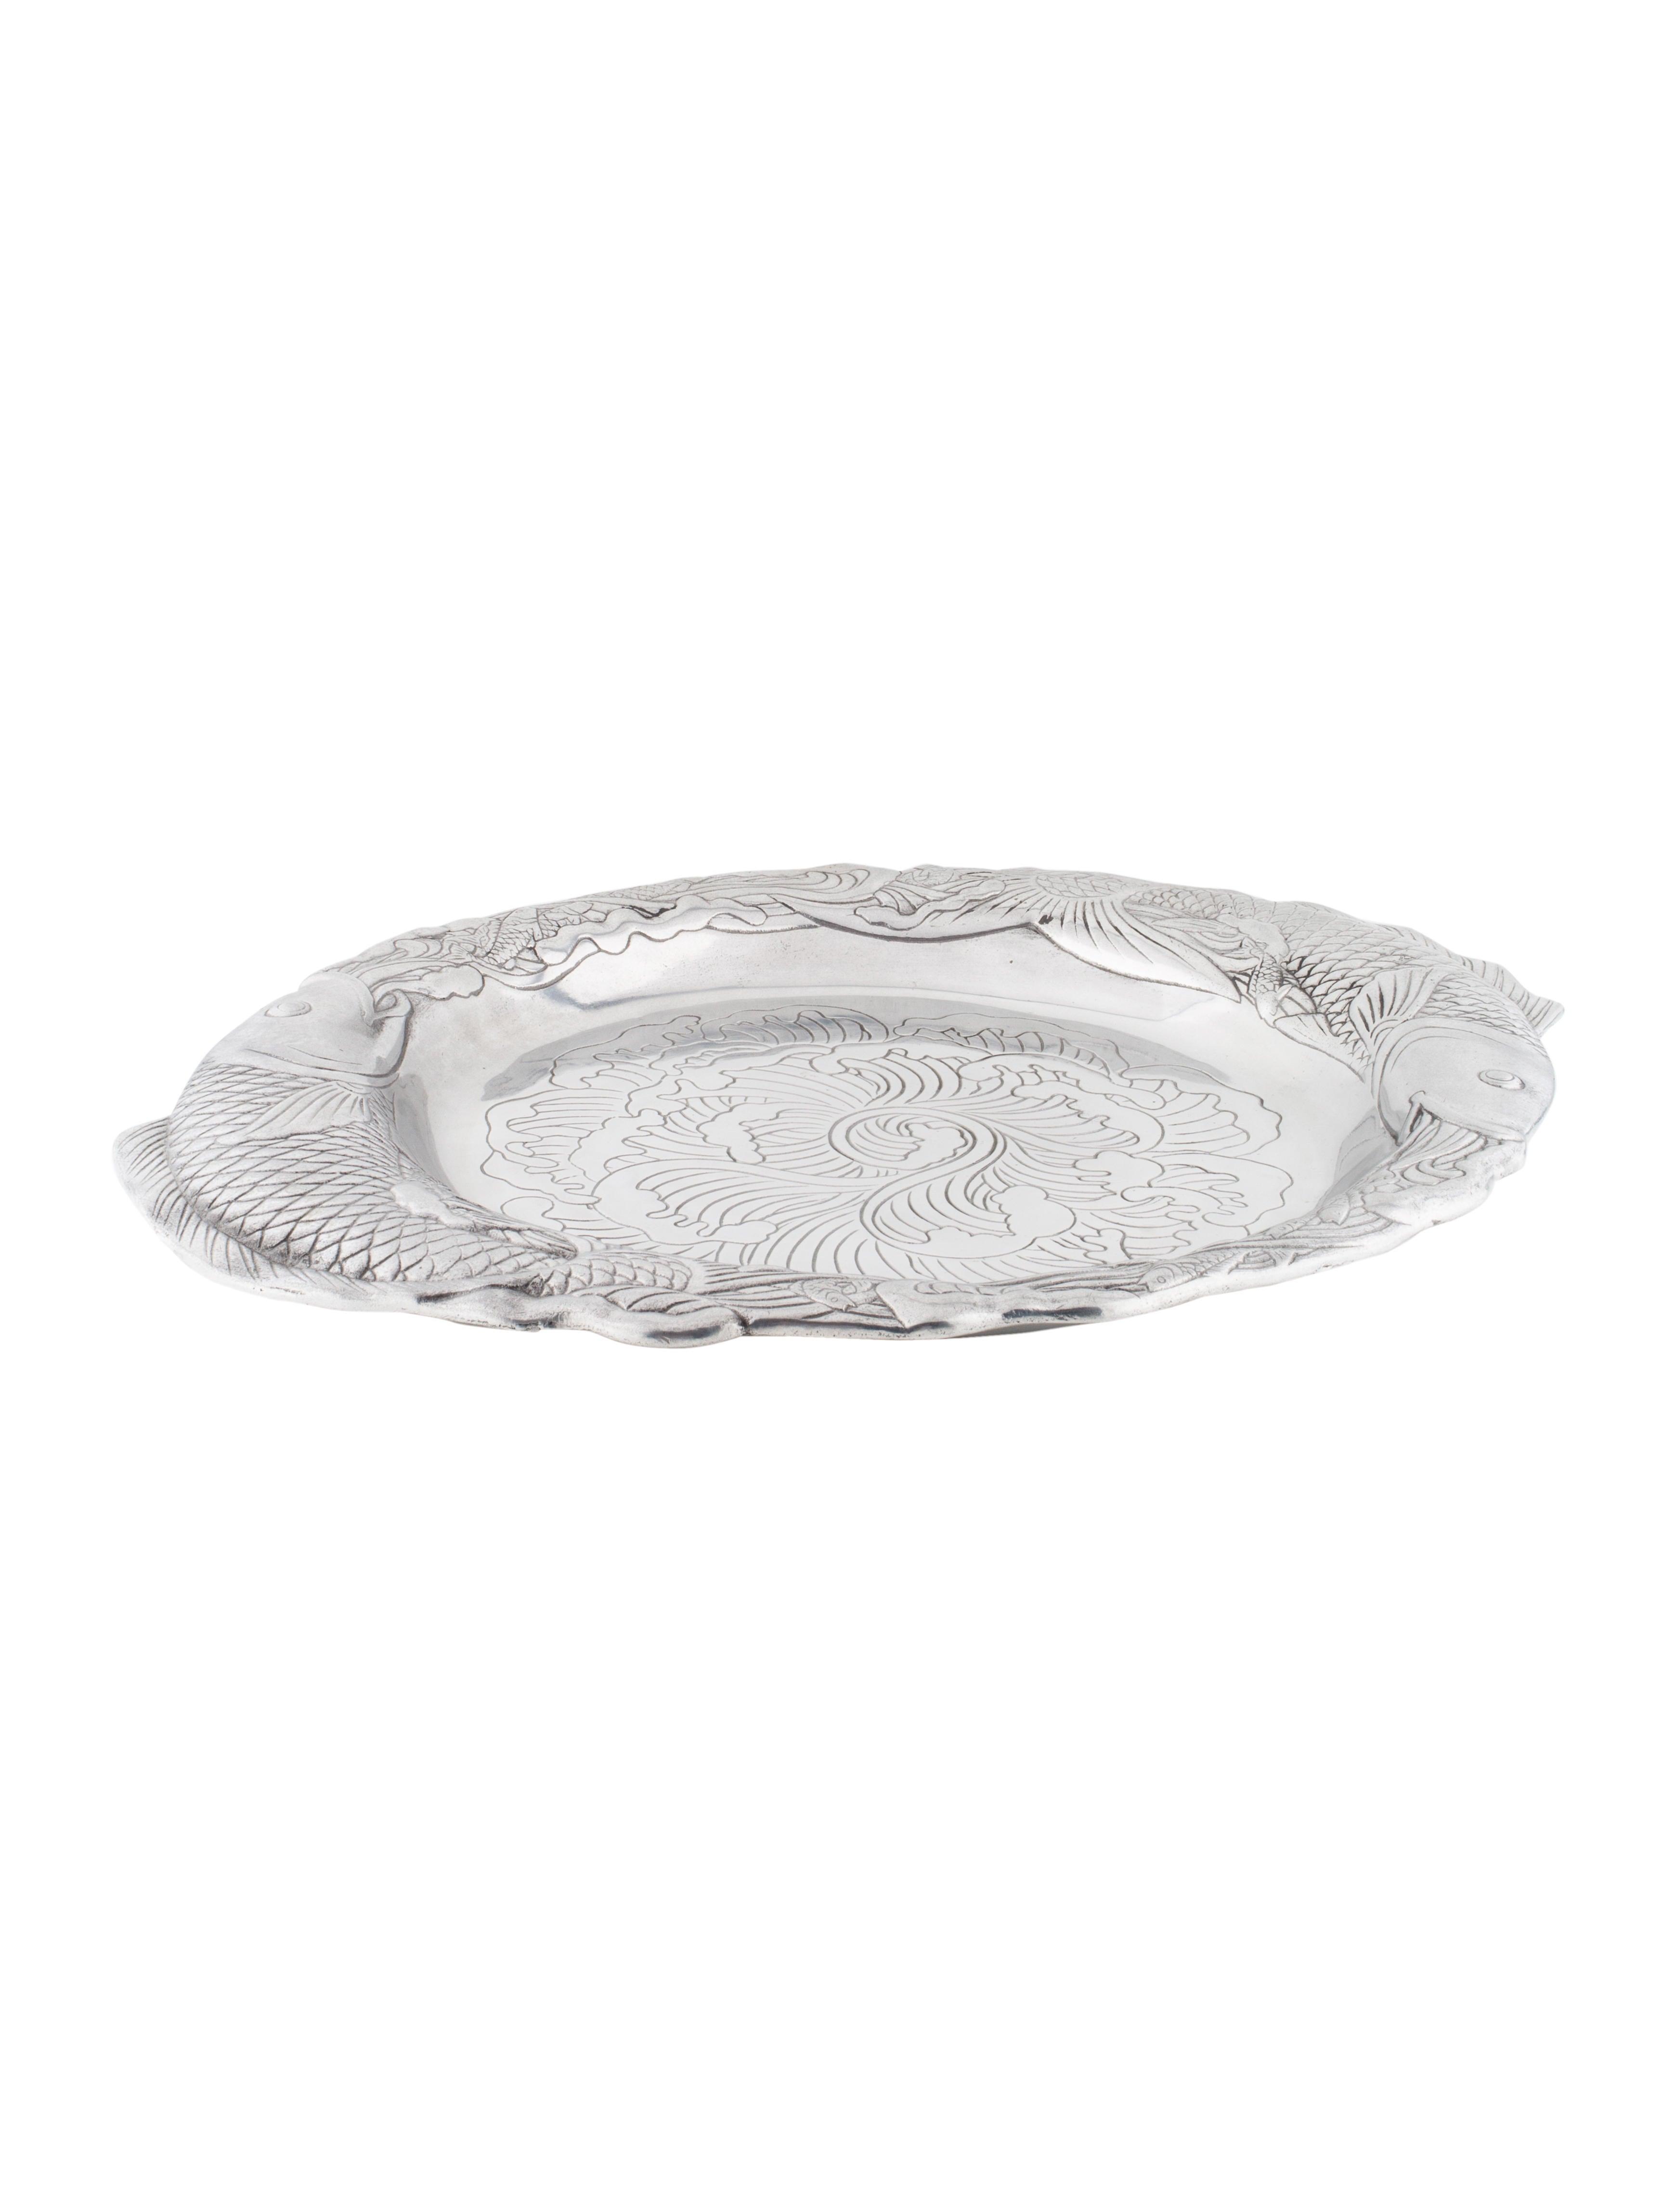 Arthur court coy fish serving platter tabletop and for Fish serving platter